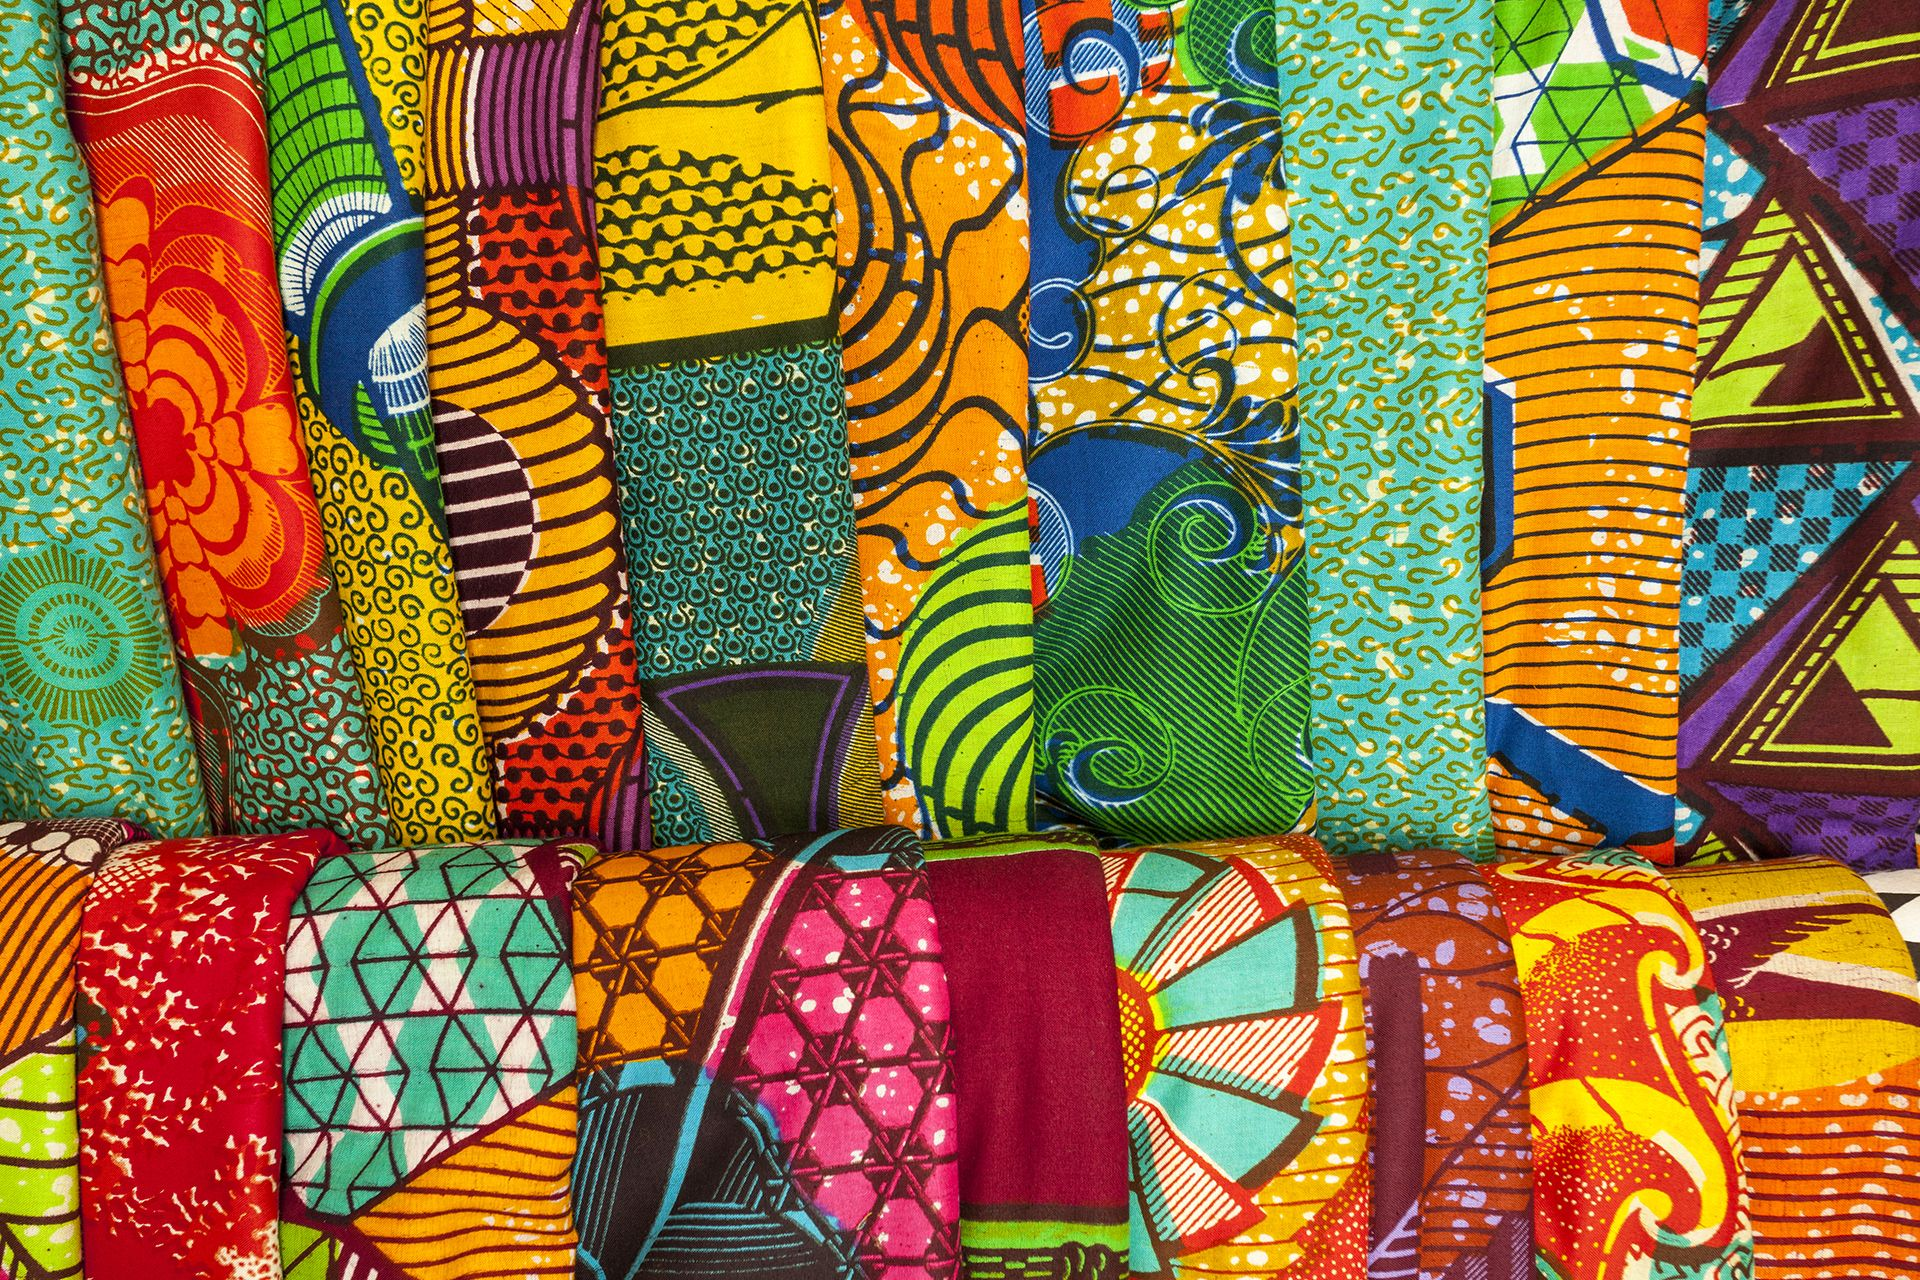 Artigianato in Ghana, tessuti Kente